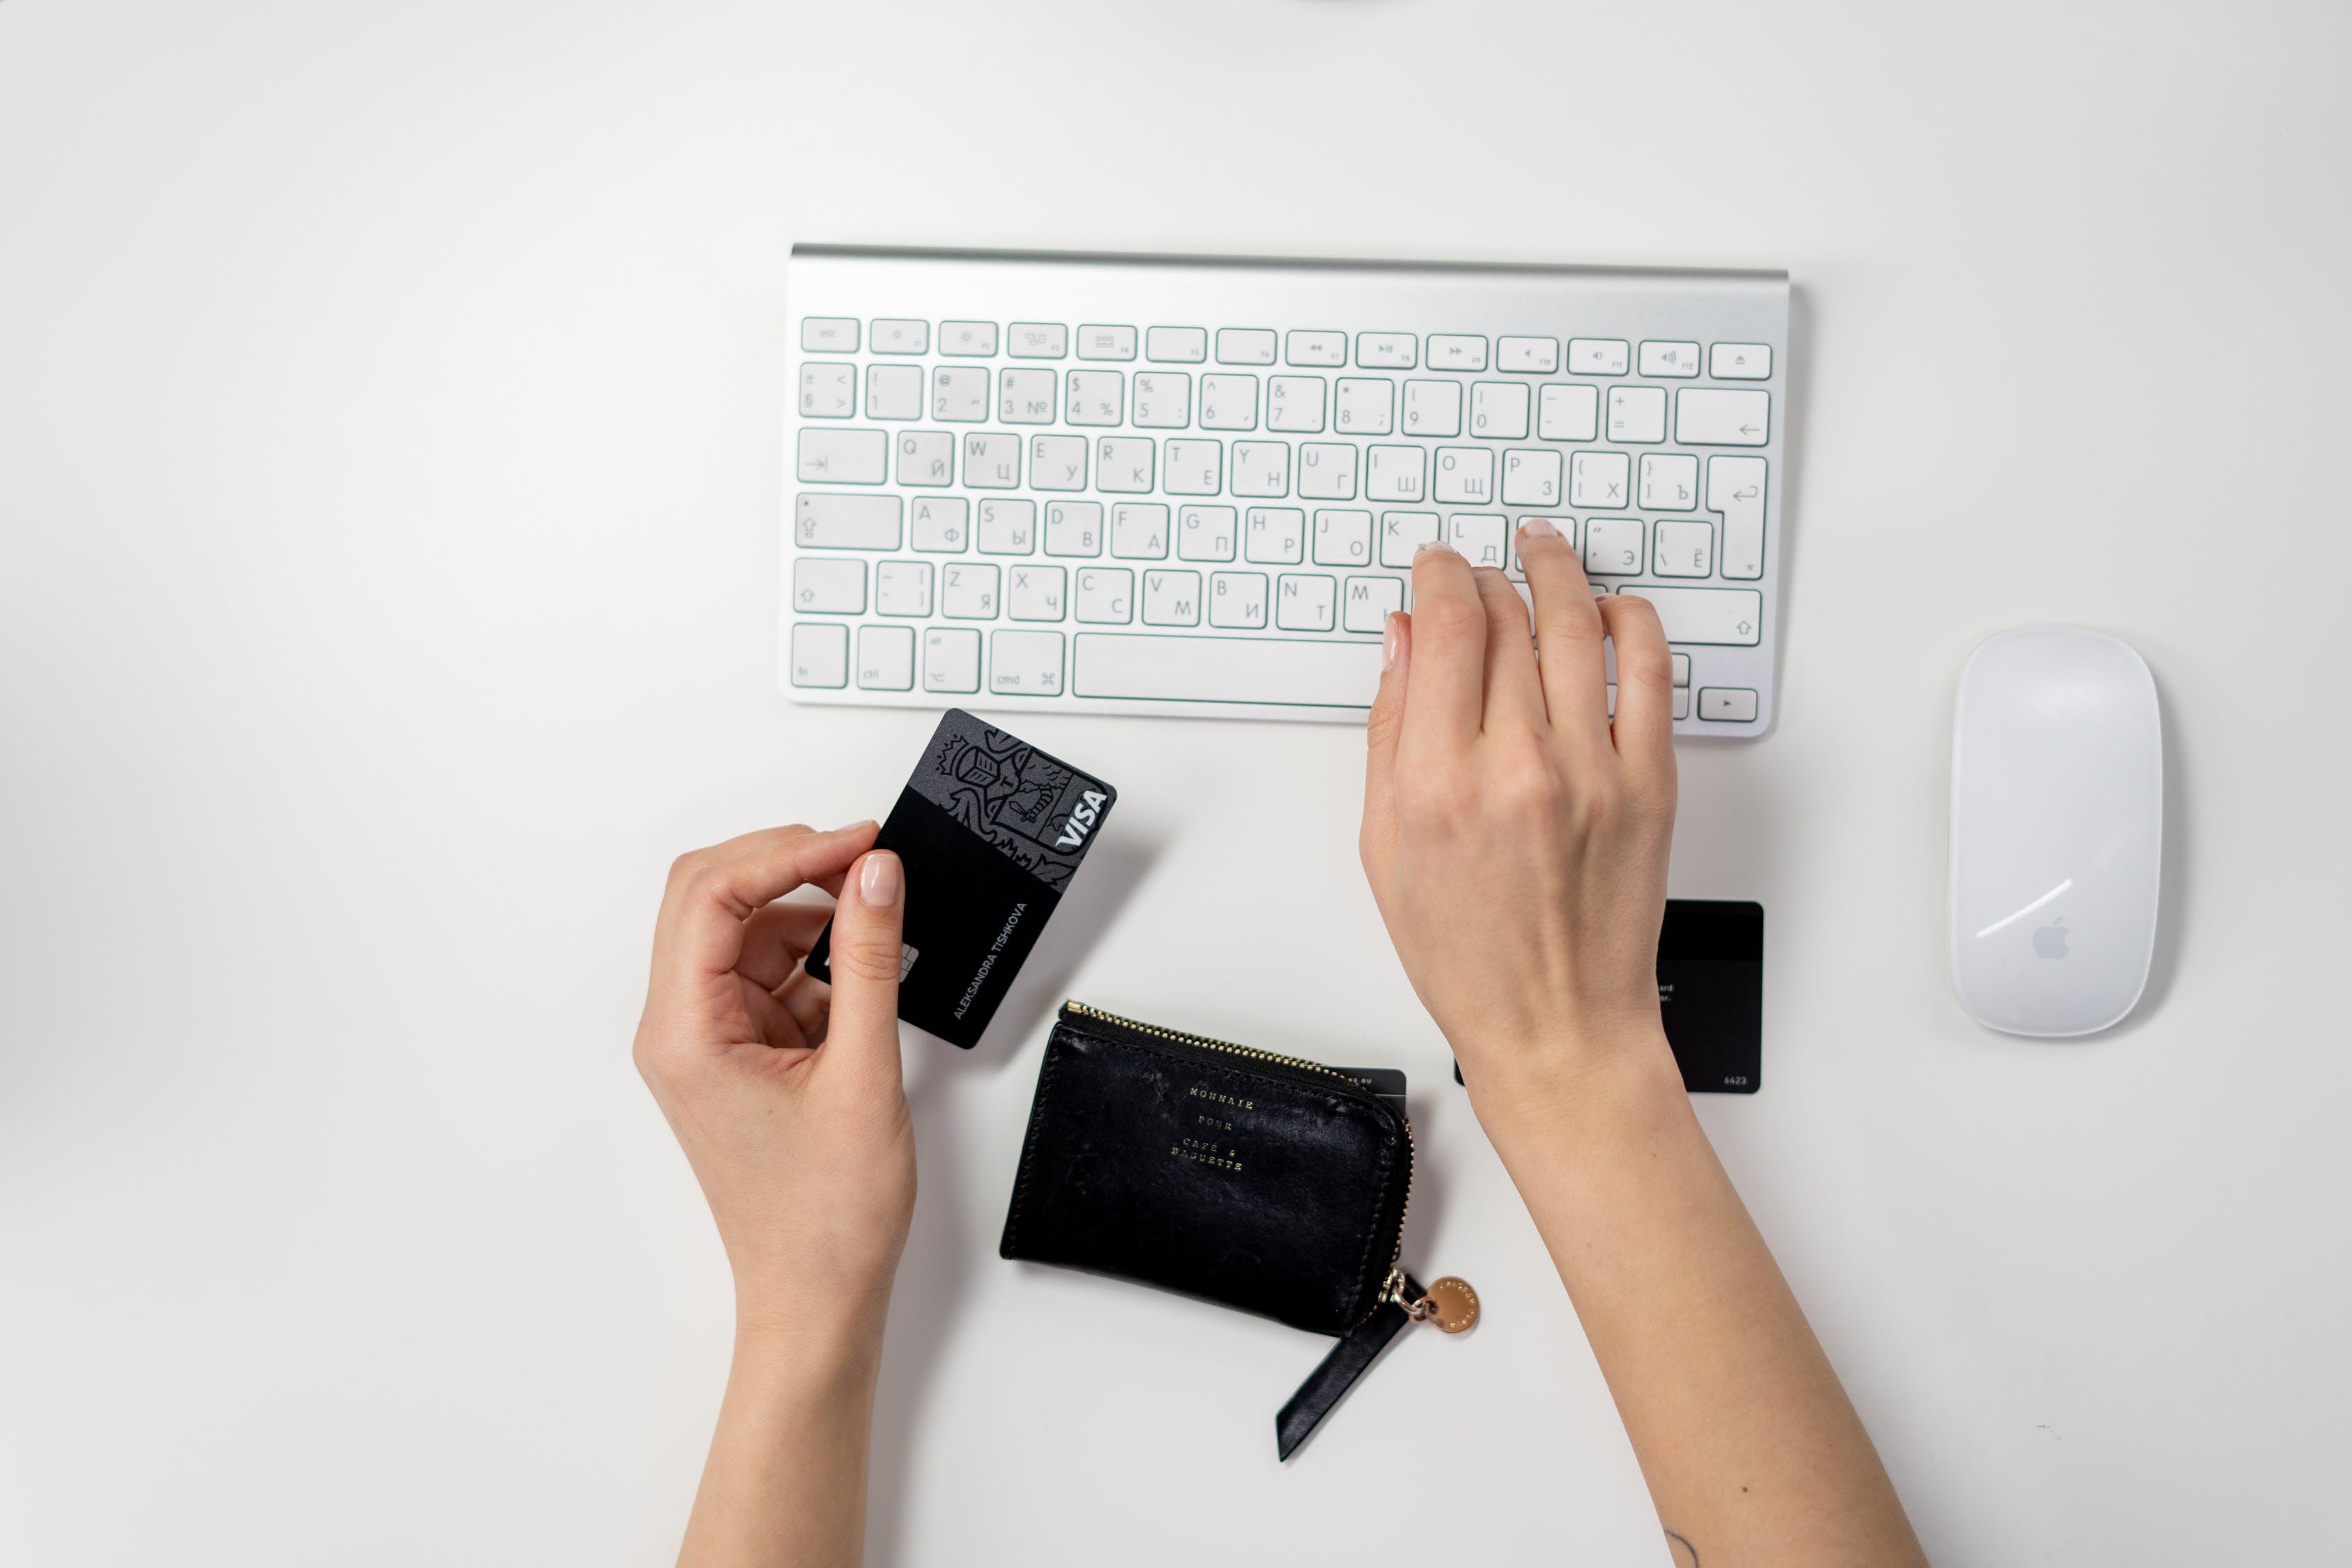 Get a Debit Card - Cautions